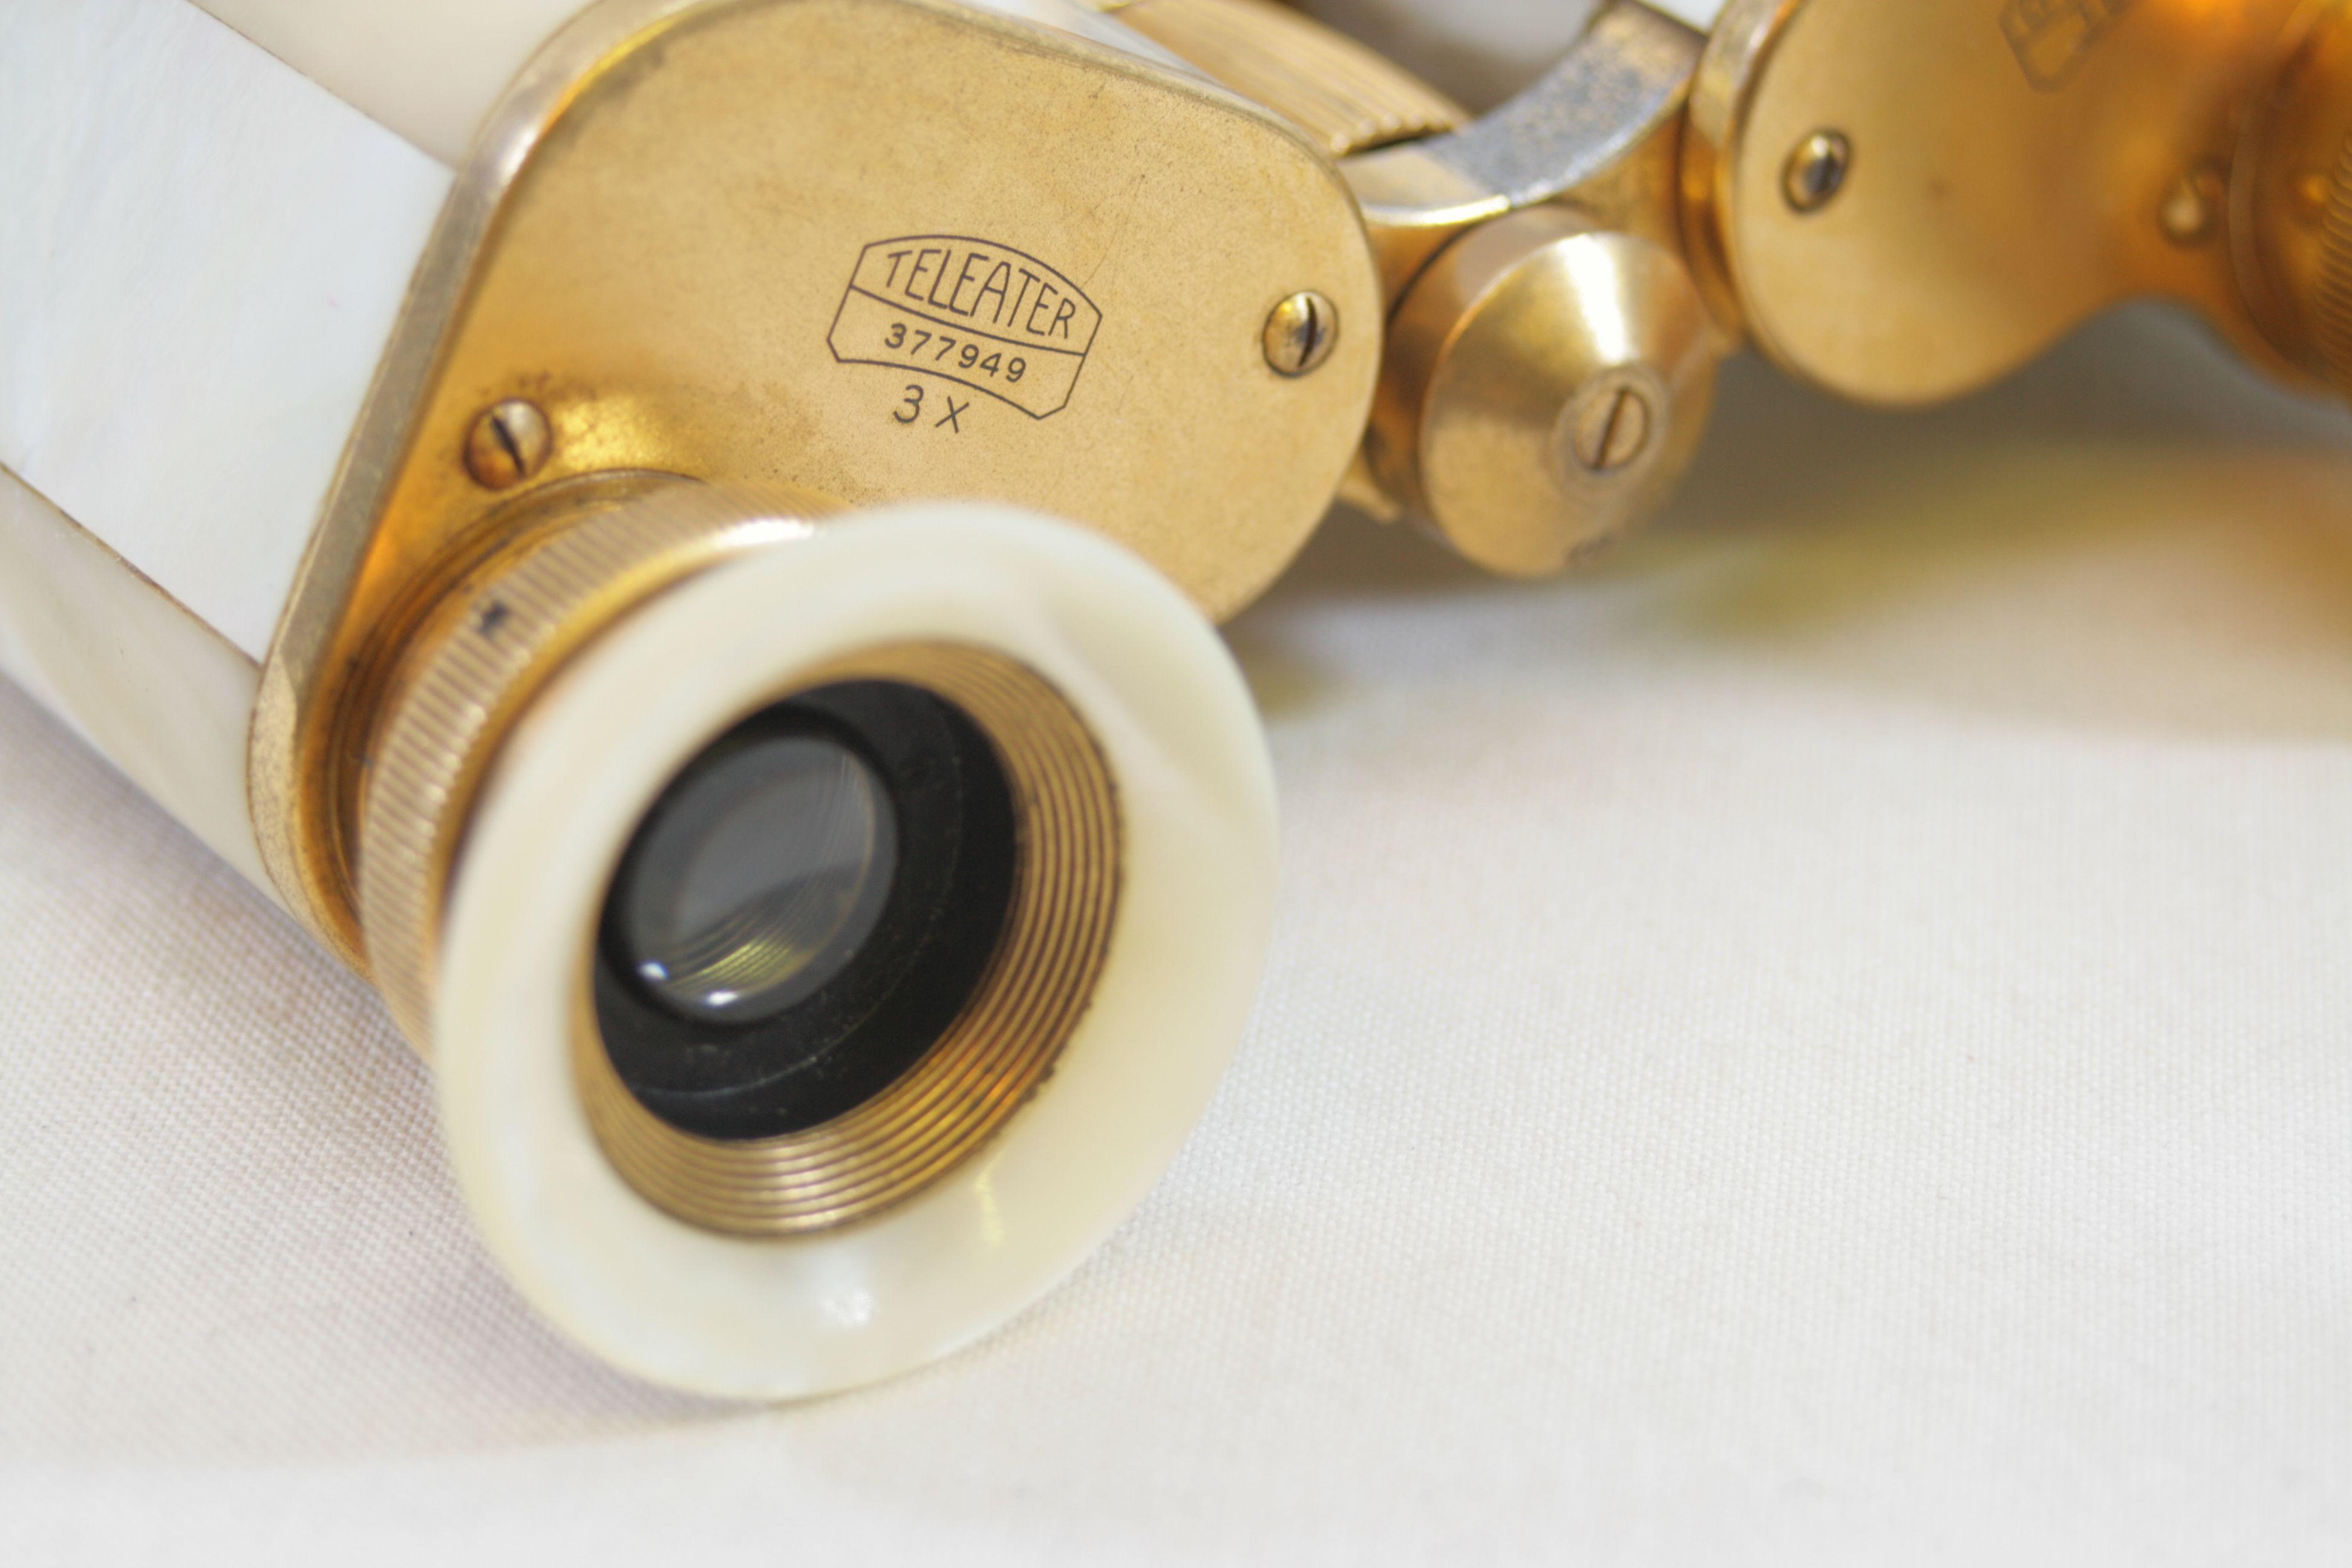 3e353d12c13 Open Full-Size Image. Carl Zeiss Jena Teleater 3 x 13.5 Prismatic Pearl  Opera Glasses   Binoculars 8